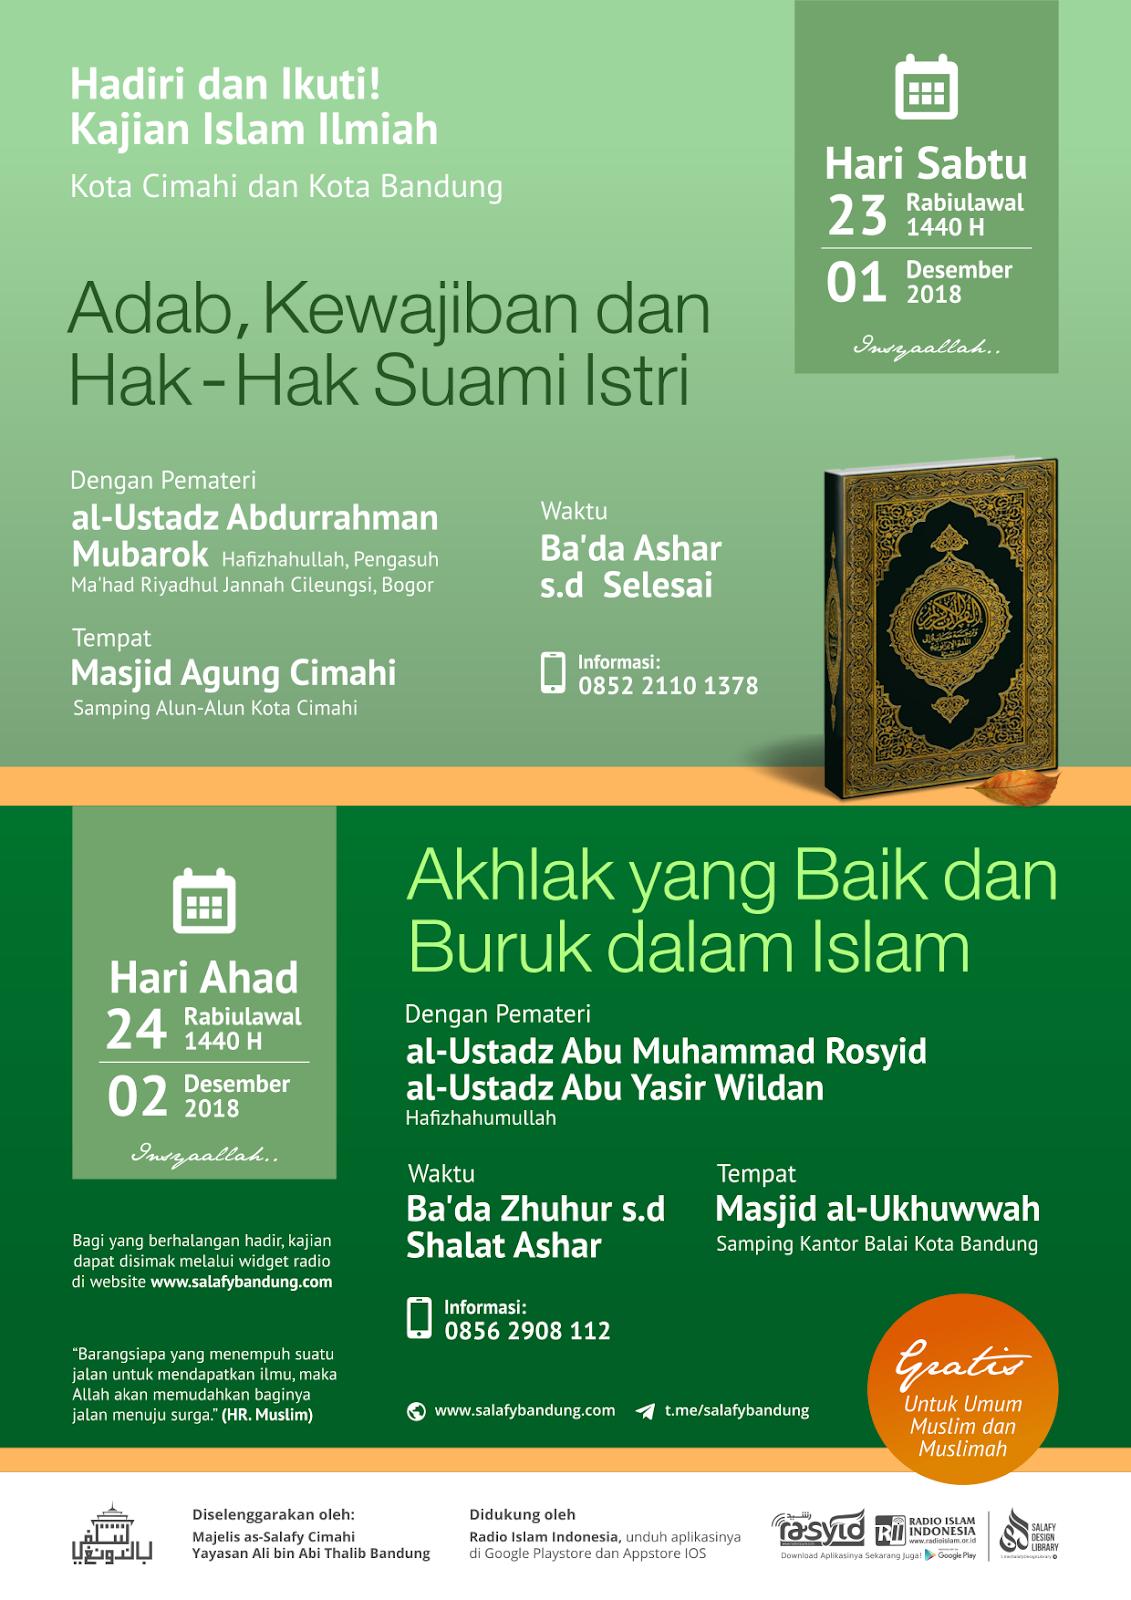 Kajian Islam Ilmiah Kota Cimahi dan Kota Bandung 23-24 Rabiulawal 1440H/1-2 Desember 2018